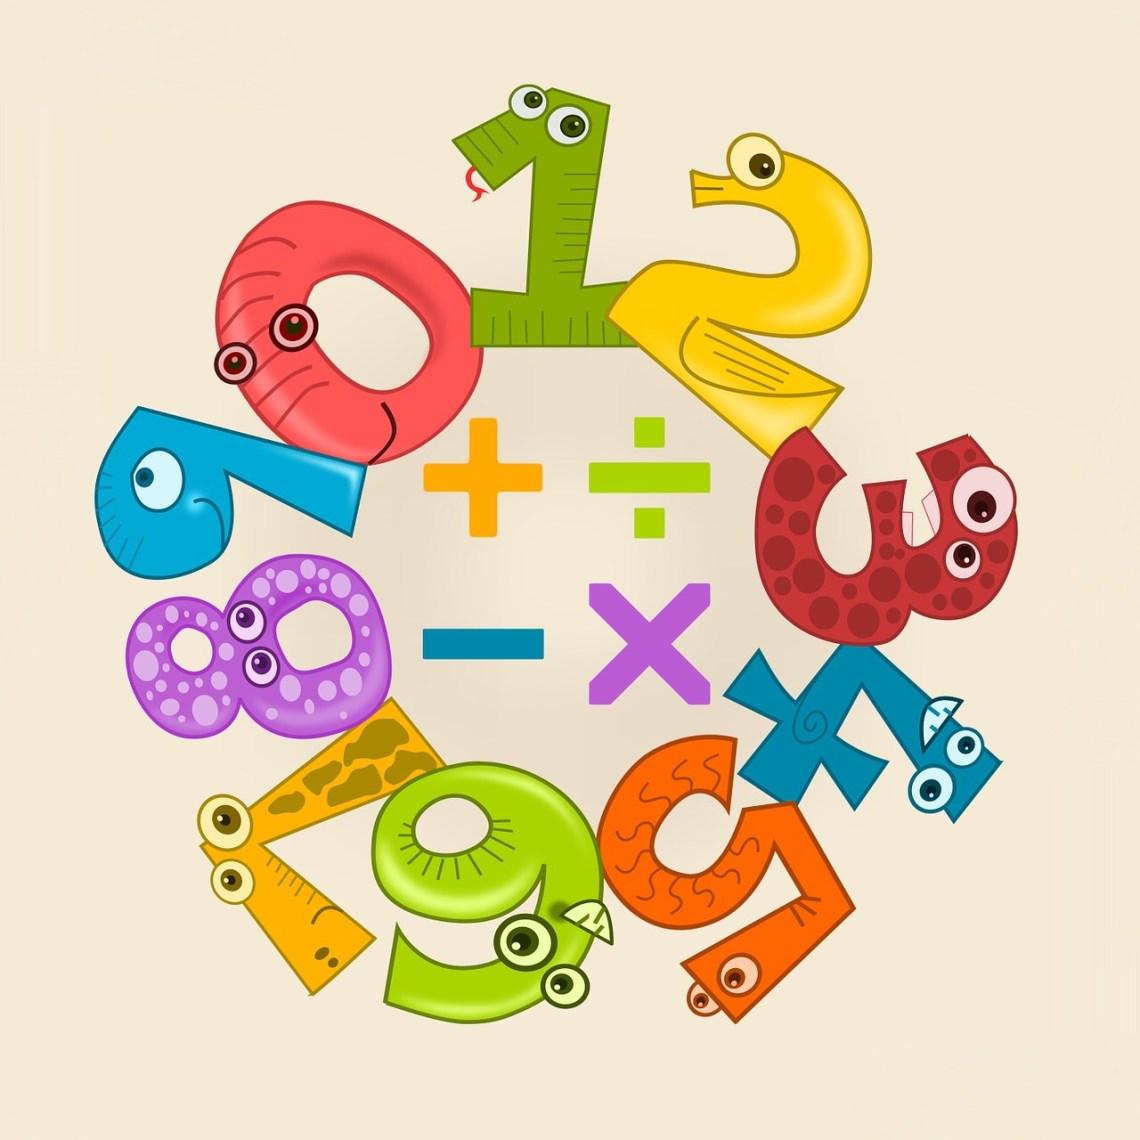 Mathématiques naturellement